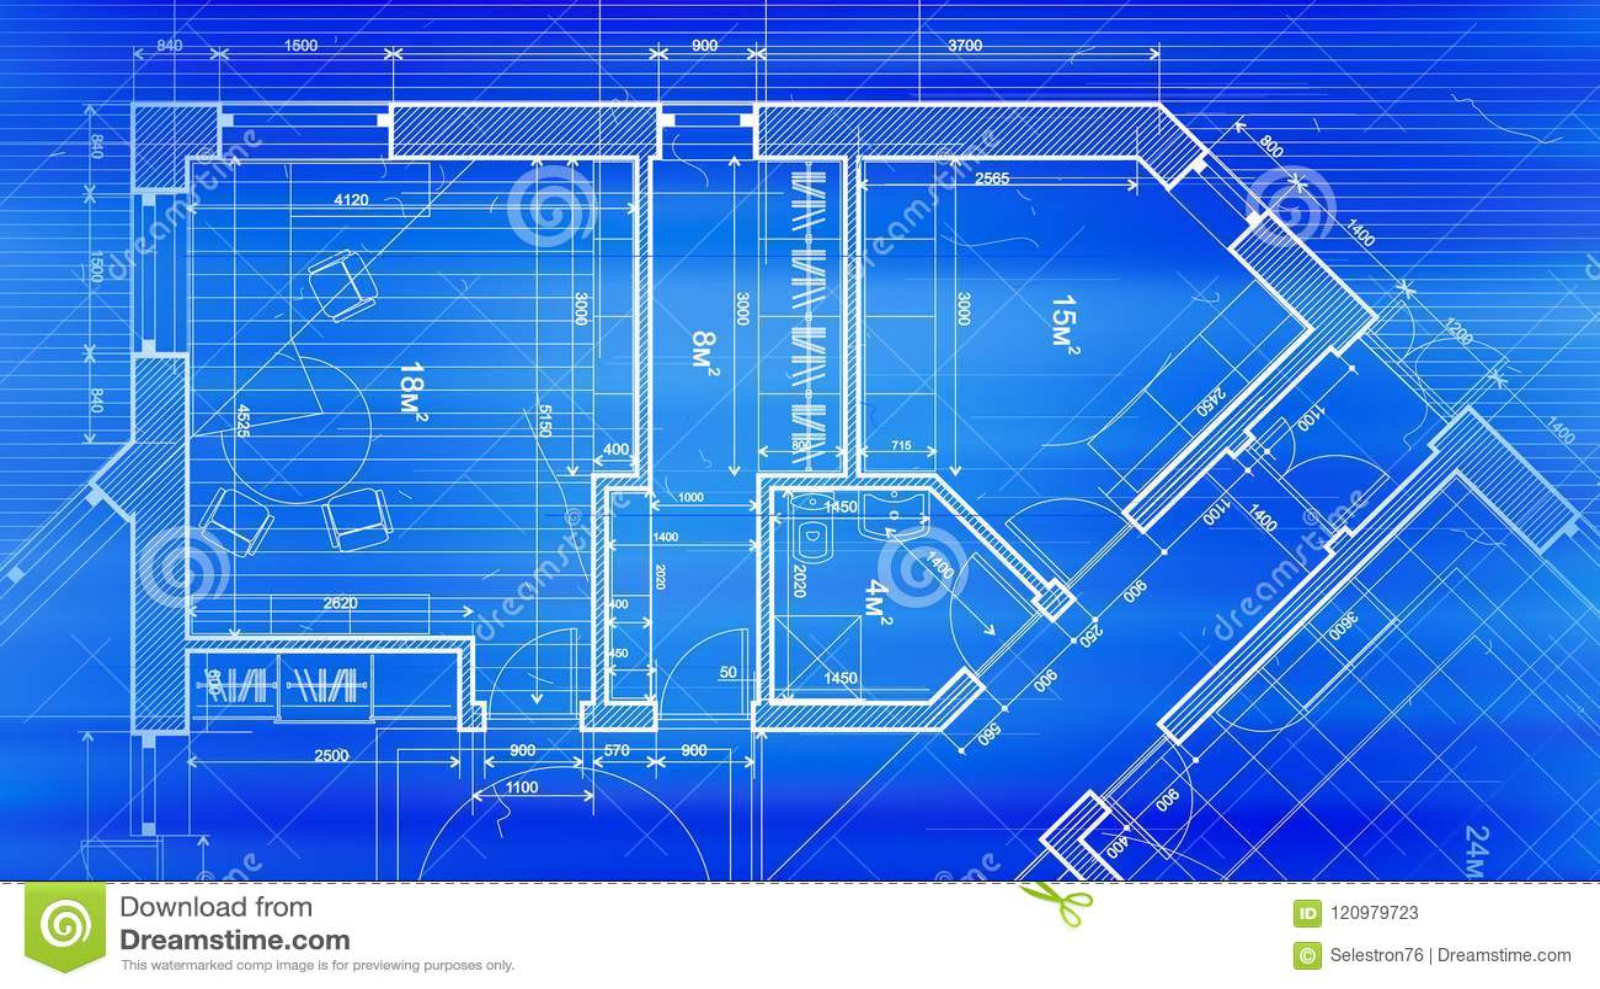 Architecture Design Blueprint In Architecture Design Blueprint Plan Vector Illustration Of Design Blueprint Plan Vector Illustration Of